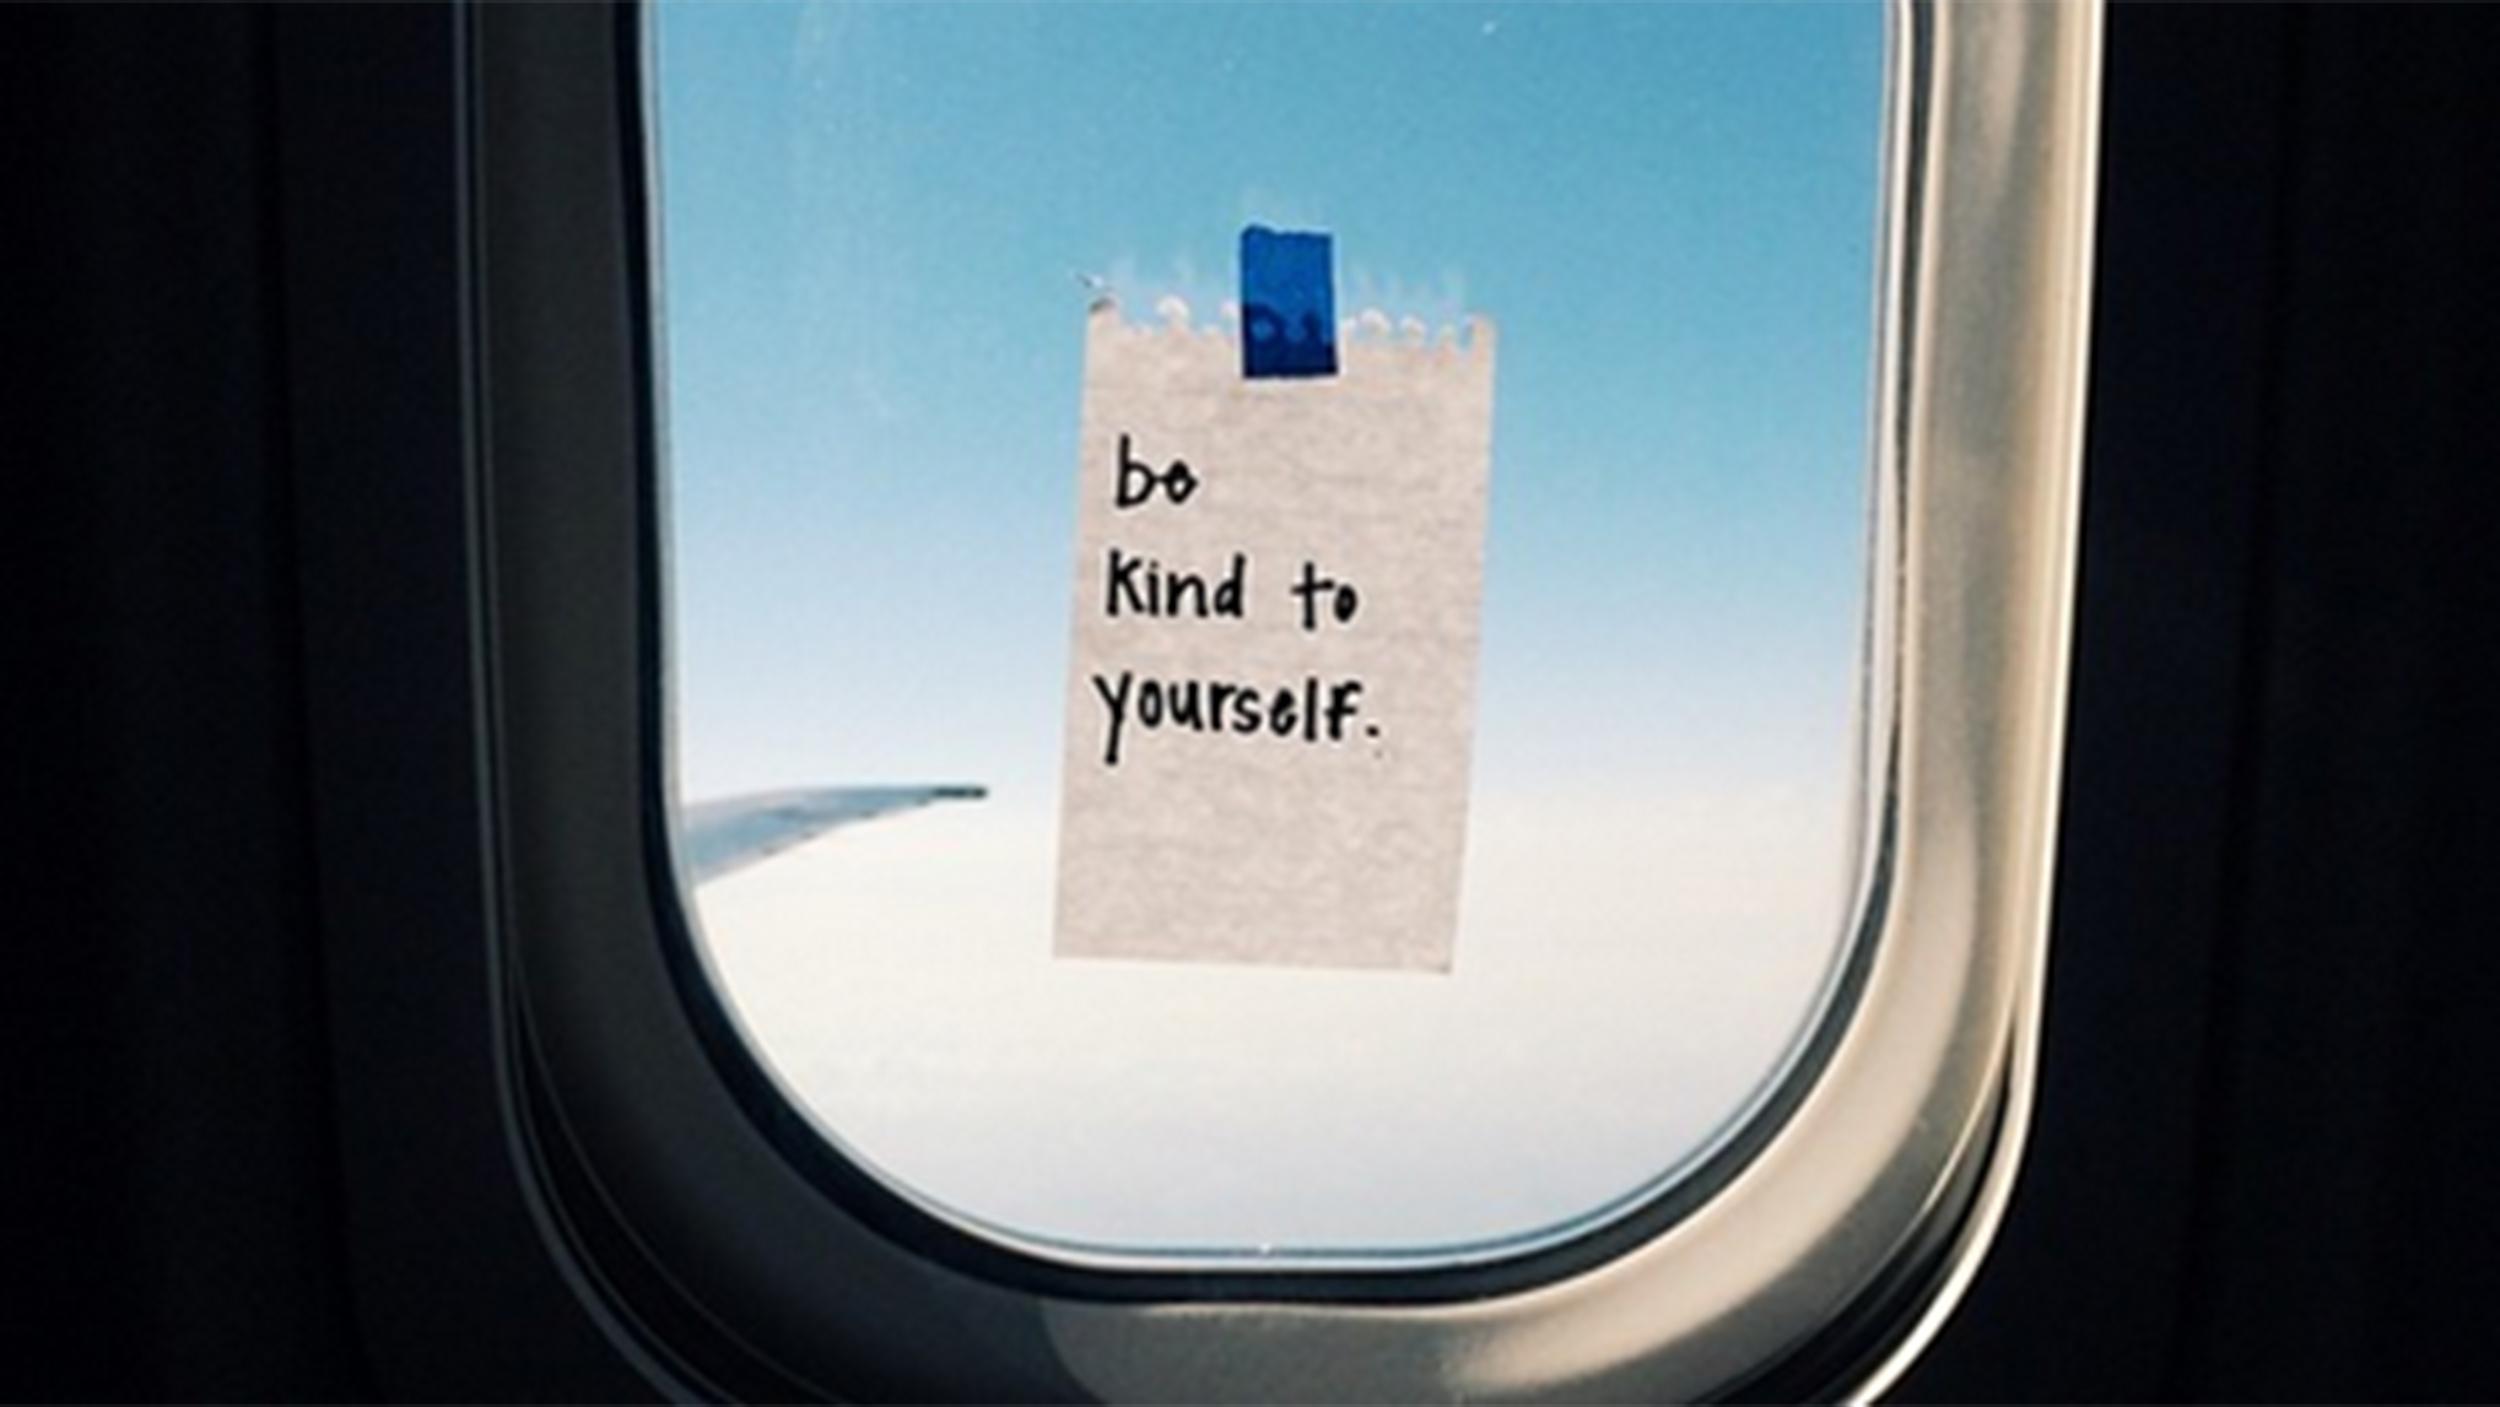 american airlines flight attendant posts inspiring notes